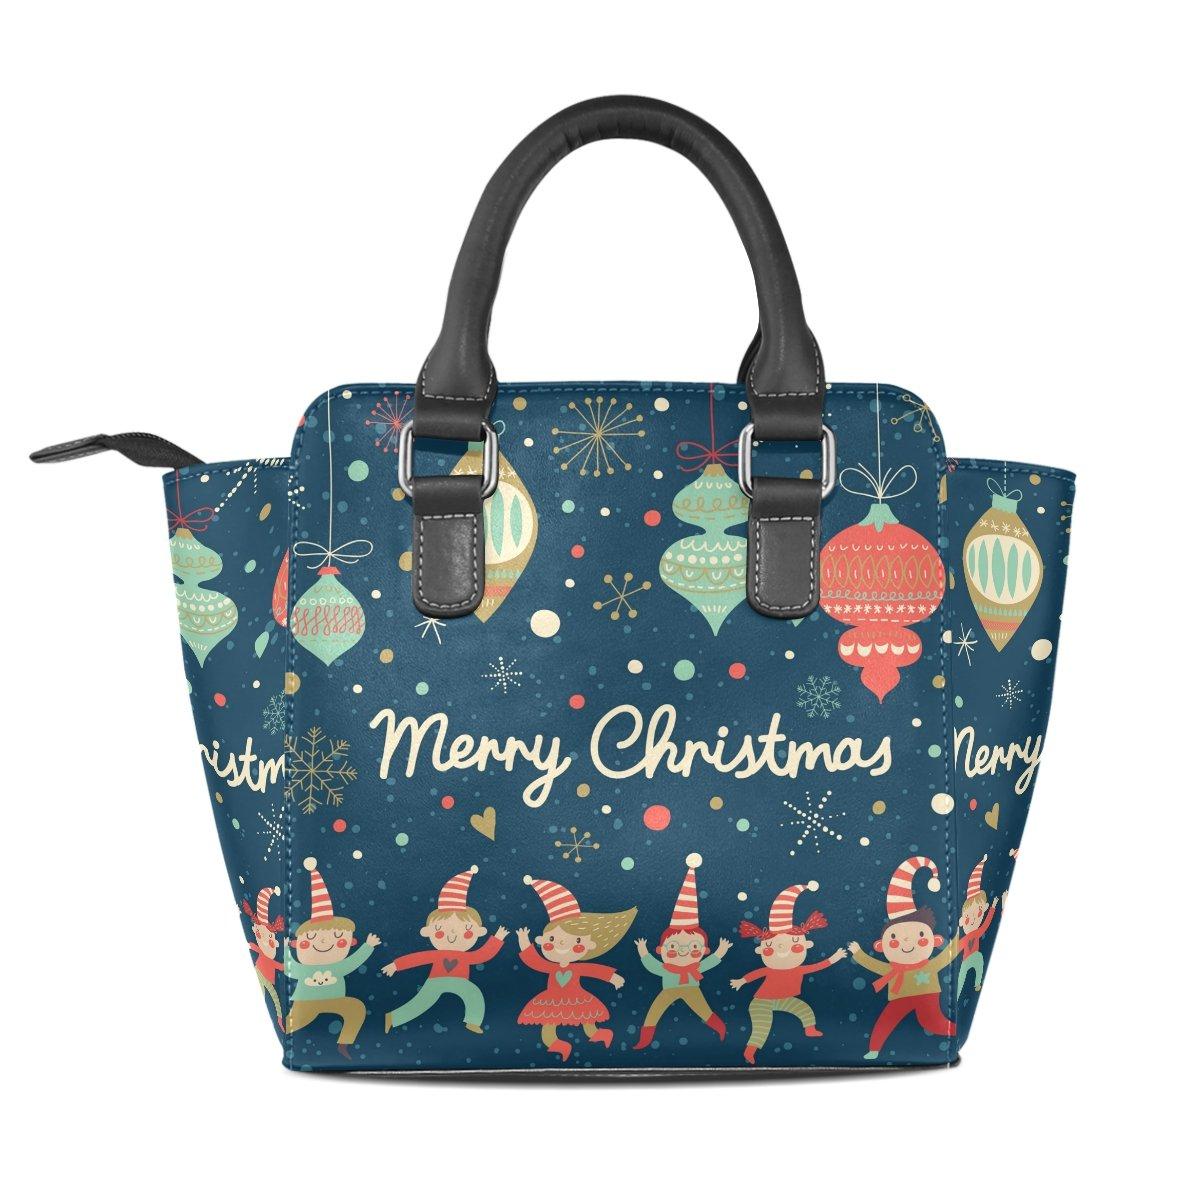 BENNIGIRY Womens Santa Claus Beard Merry Christmas Top-Handle Handbags Shoulder Bag With Removable Shoulder Strap